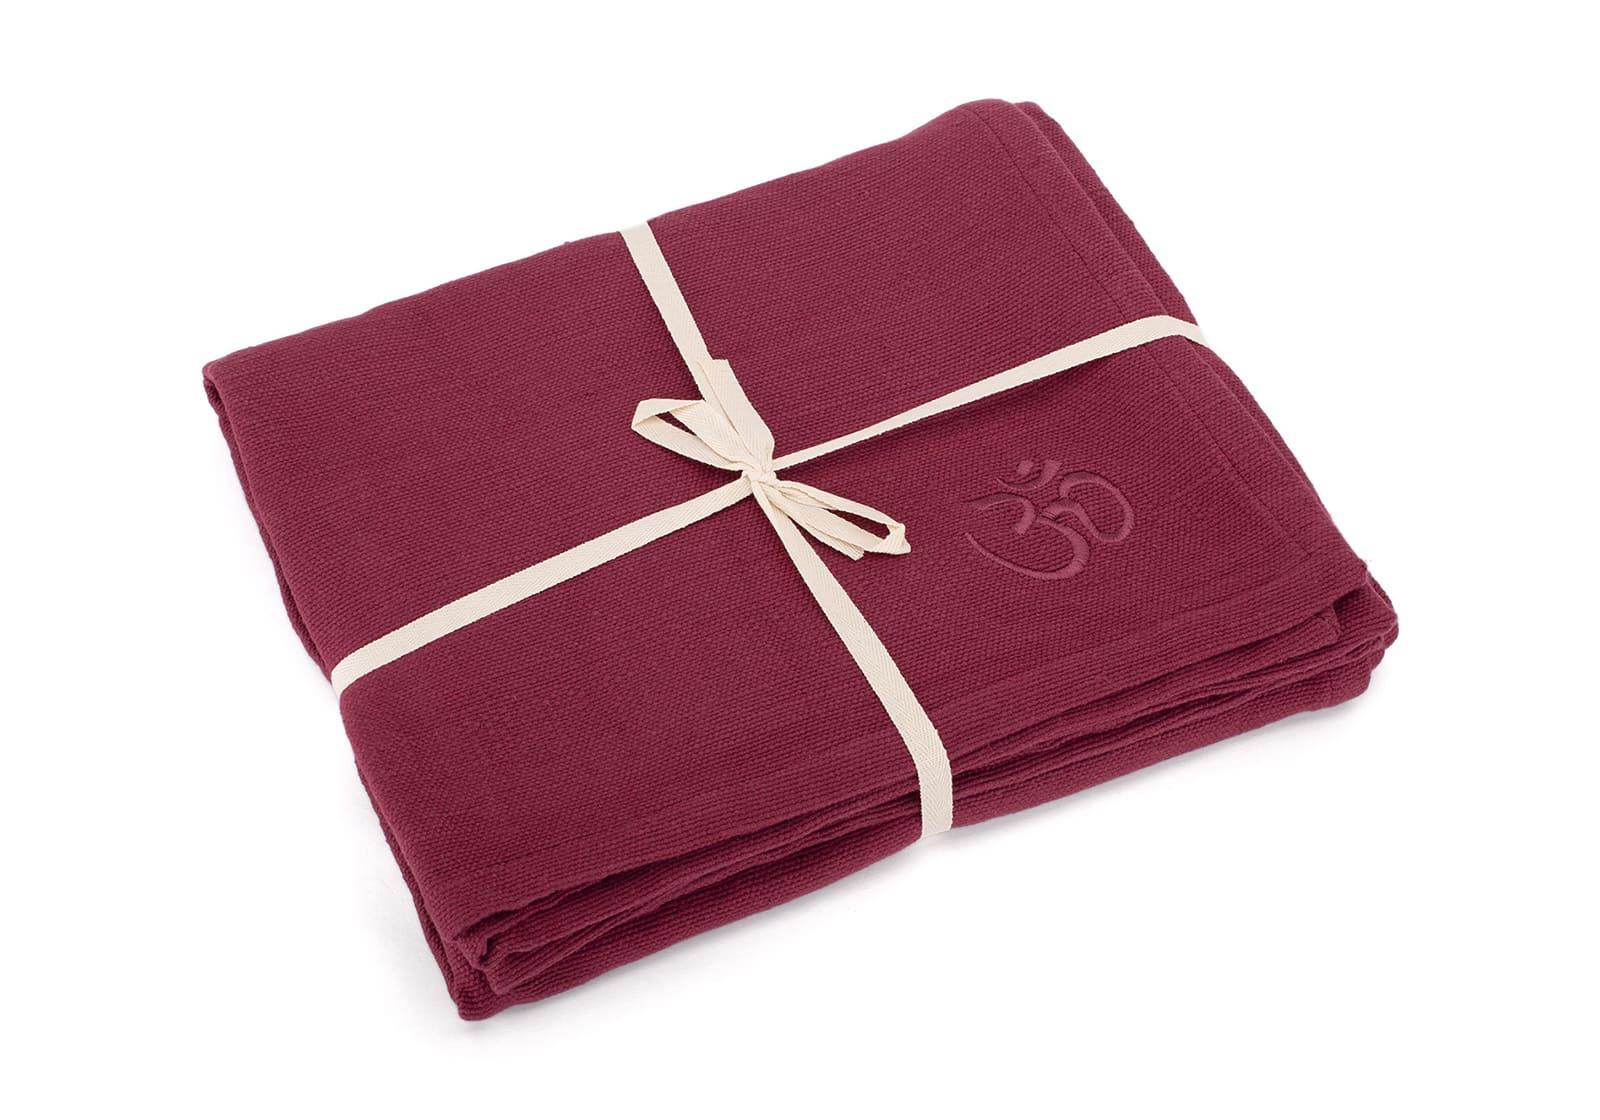 Bodhi_Yoga-blanket-SHAVASANA_cotton-burgundy_2.jpg